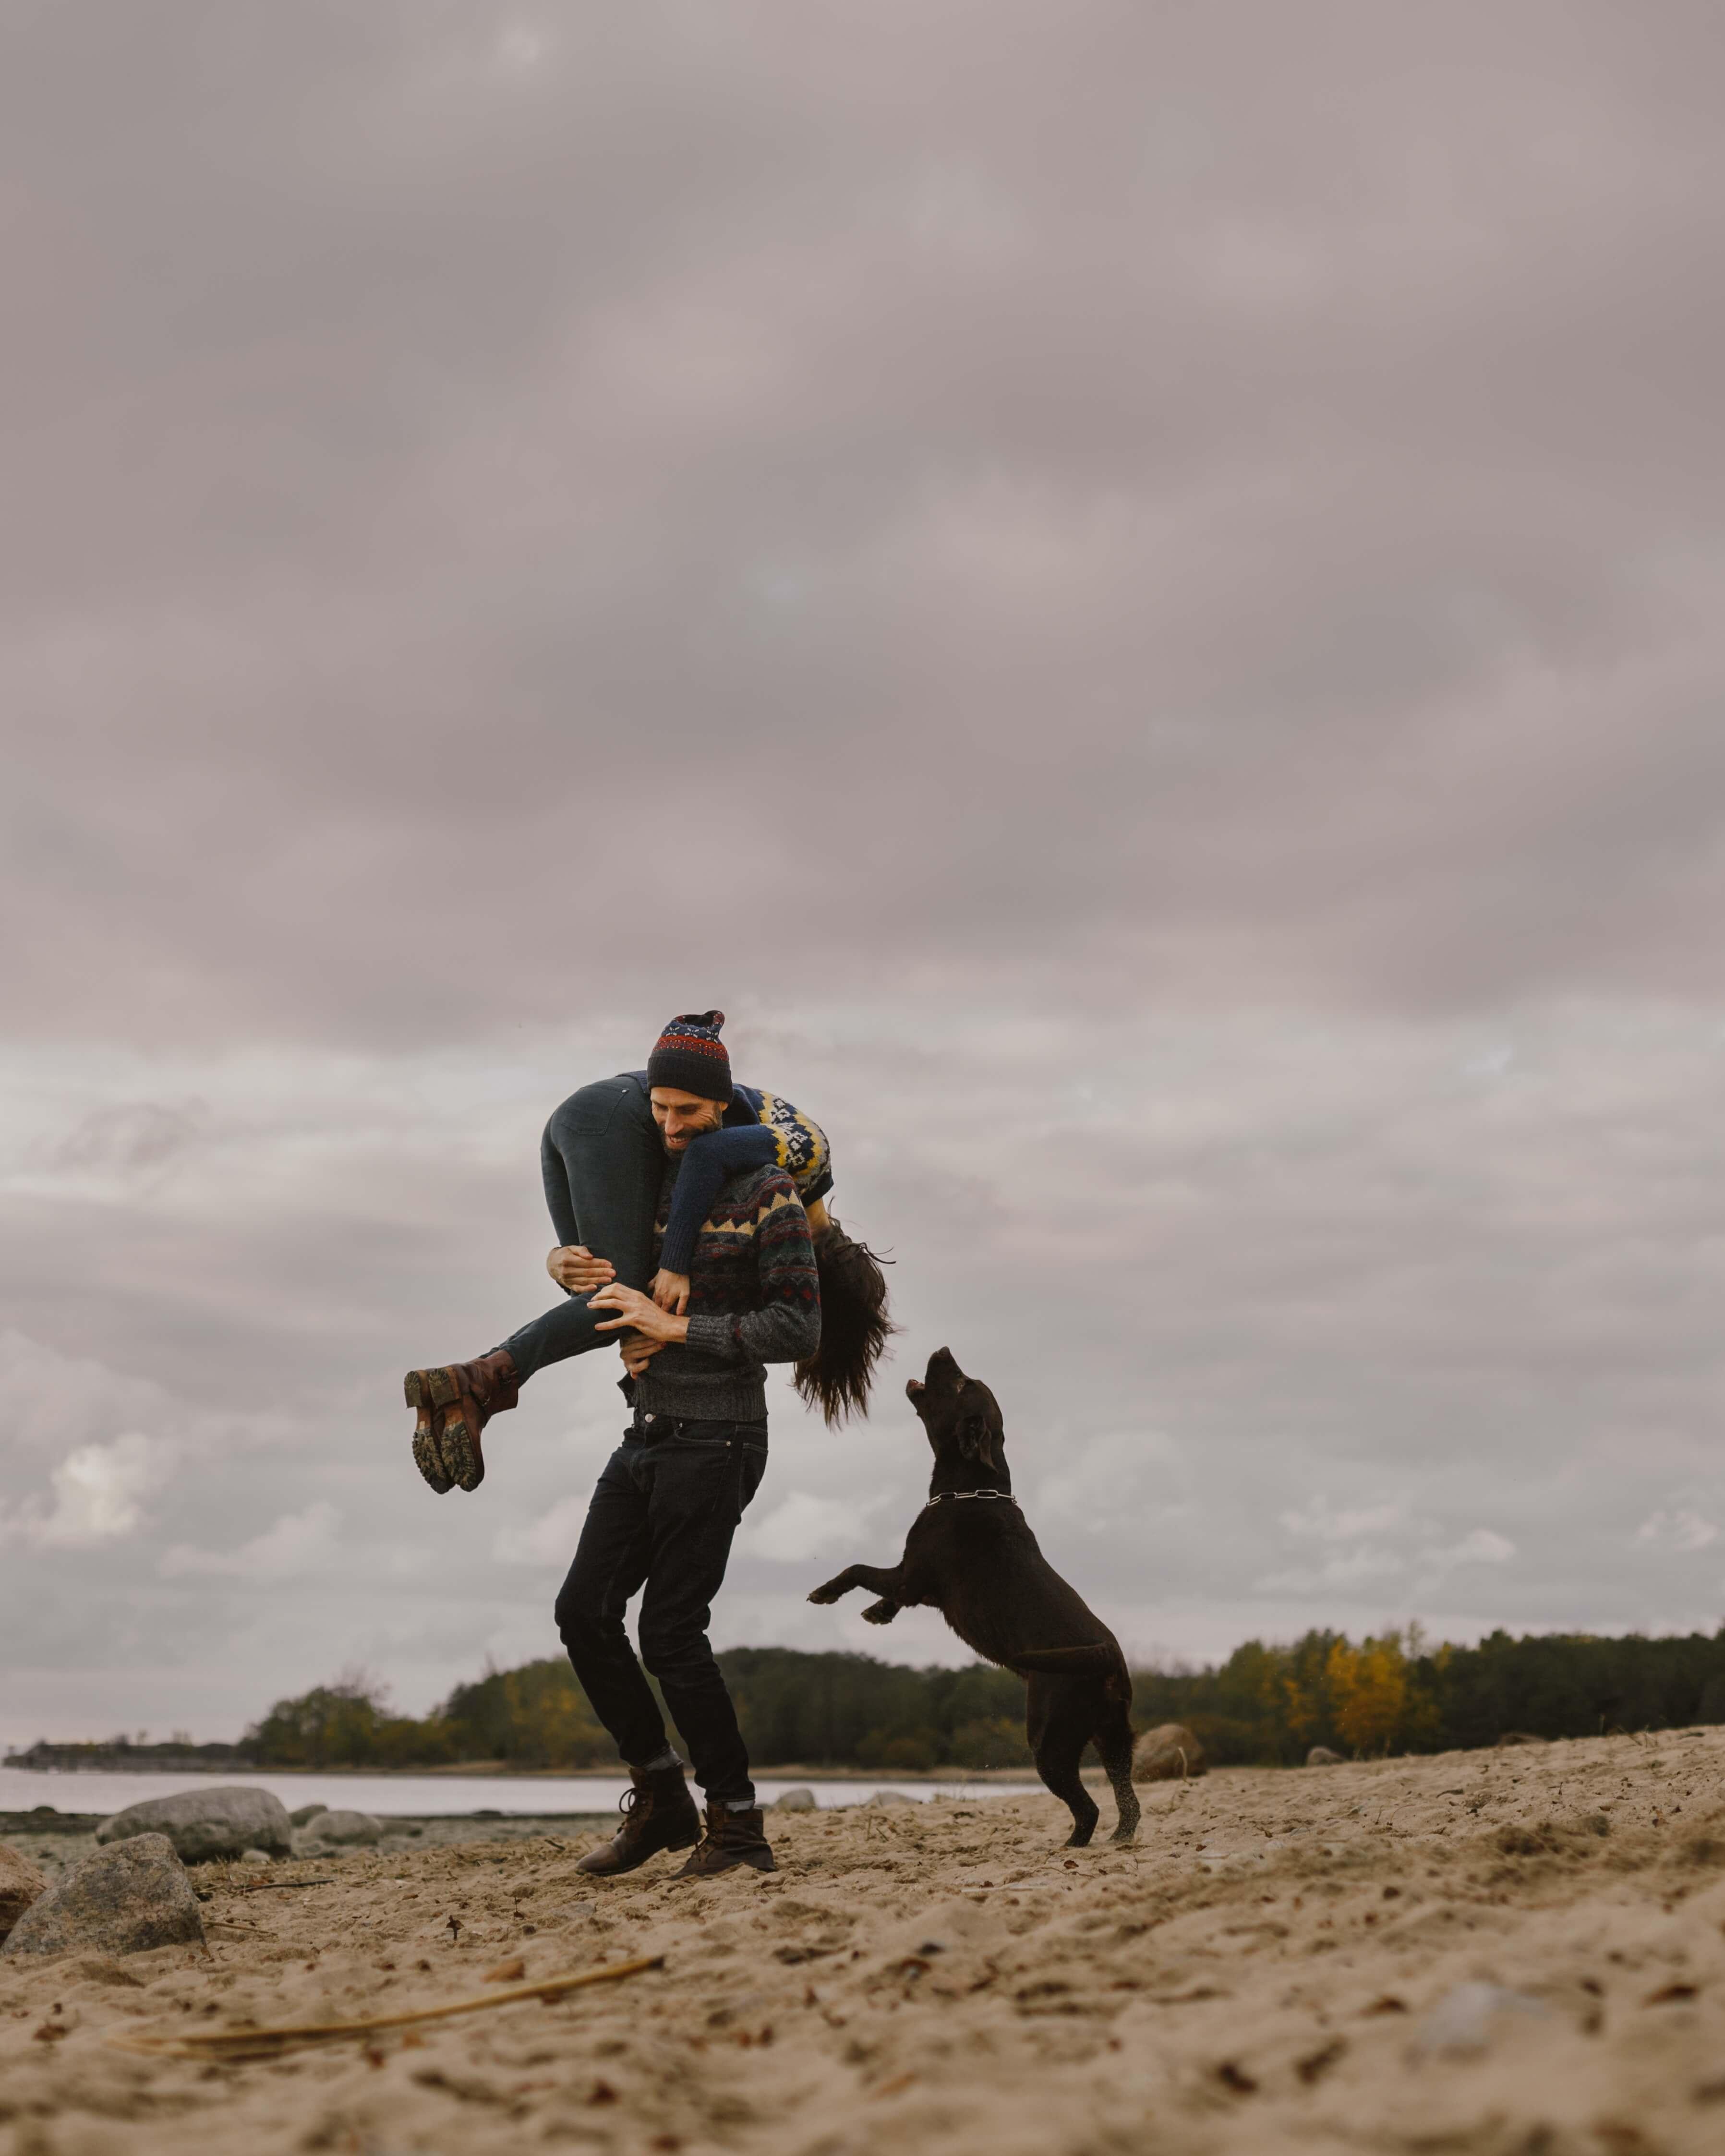 Man picking up woman while dog jumps